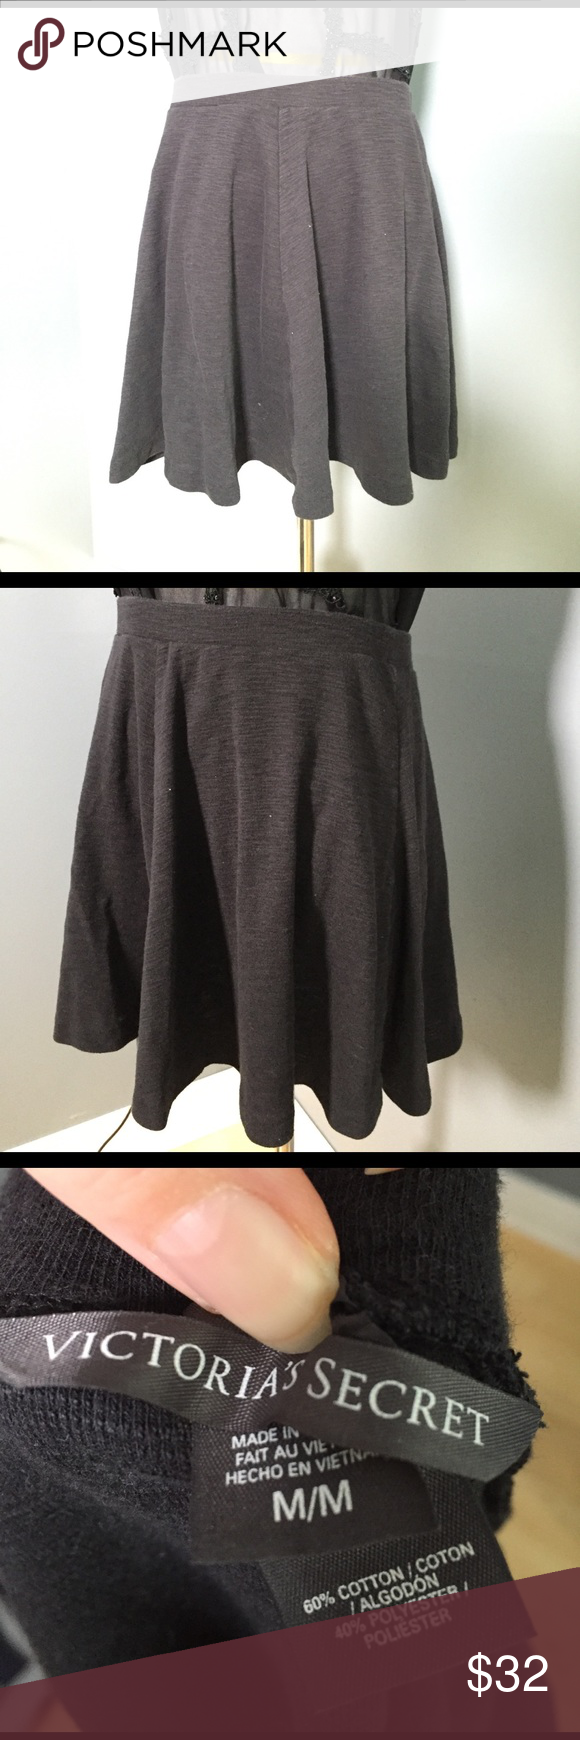 Victoria's Secret black skirt Black casual knit marled skirt. Victoria's Secret brand. 16 inches long. Victoria's Secret Skirts Circle & Skater